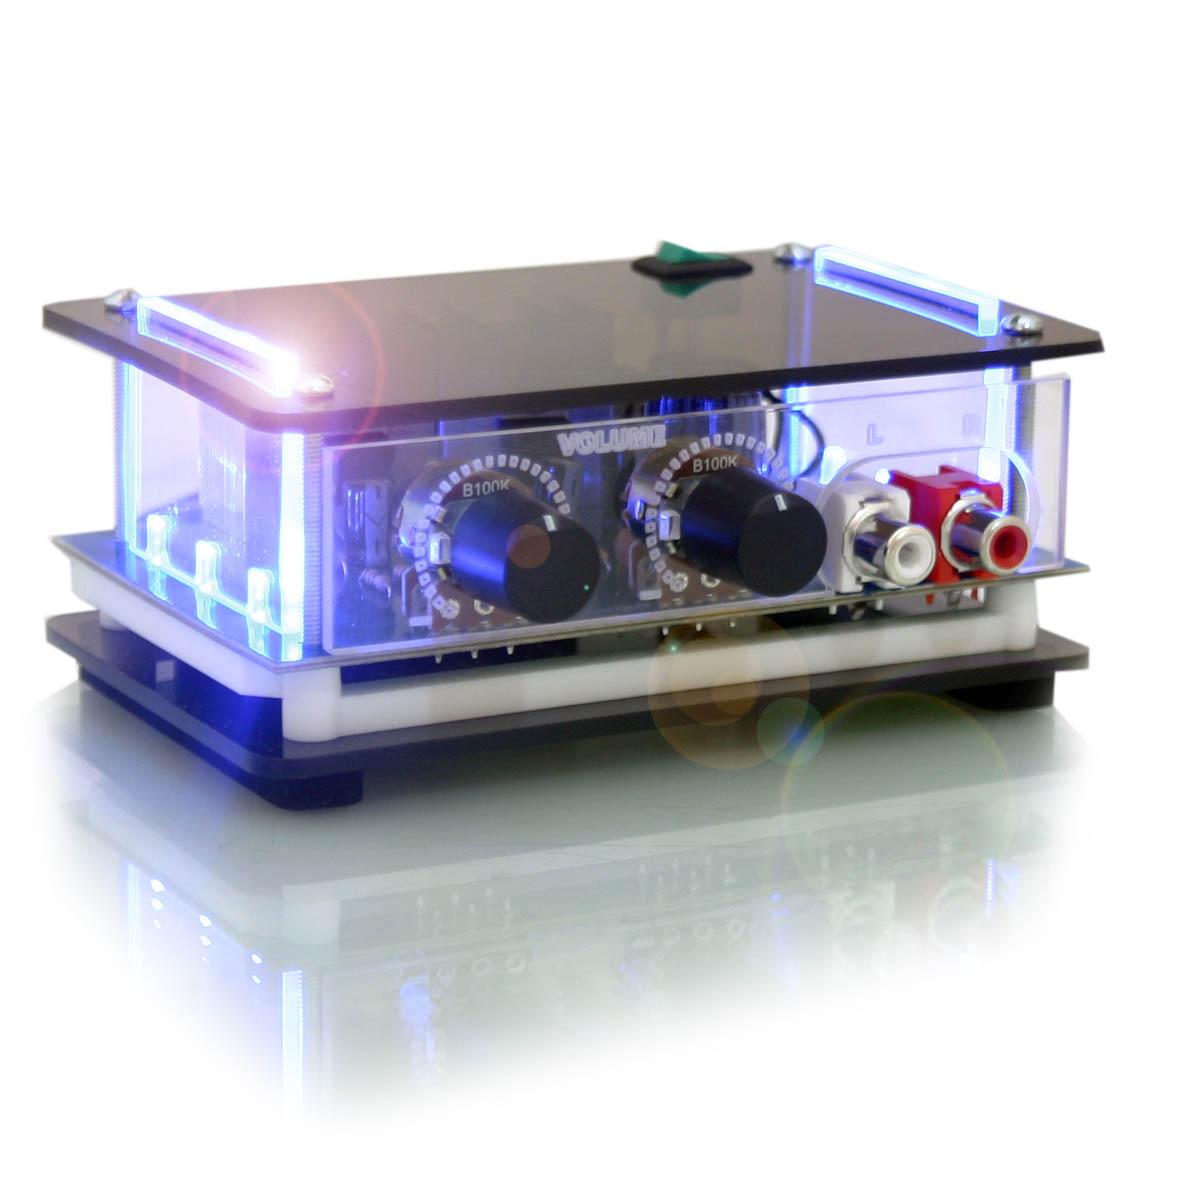 kit som ambiente mini amplificador estéreo e 2 arandelas redondas de embutir